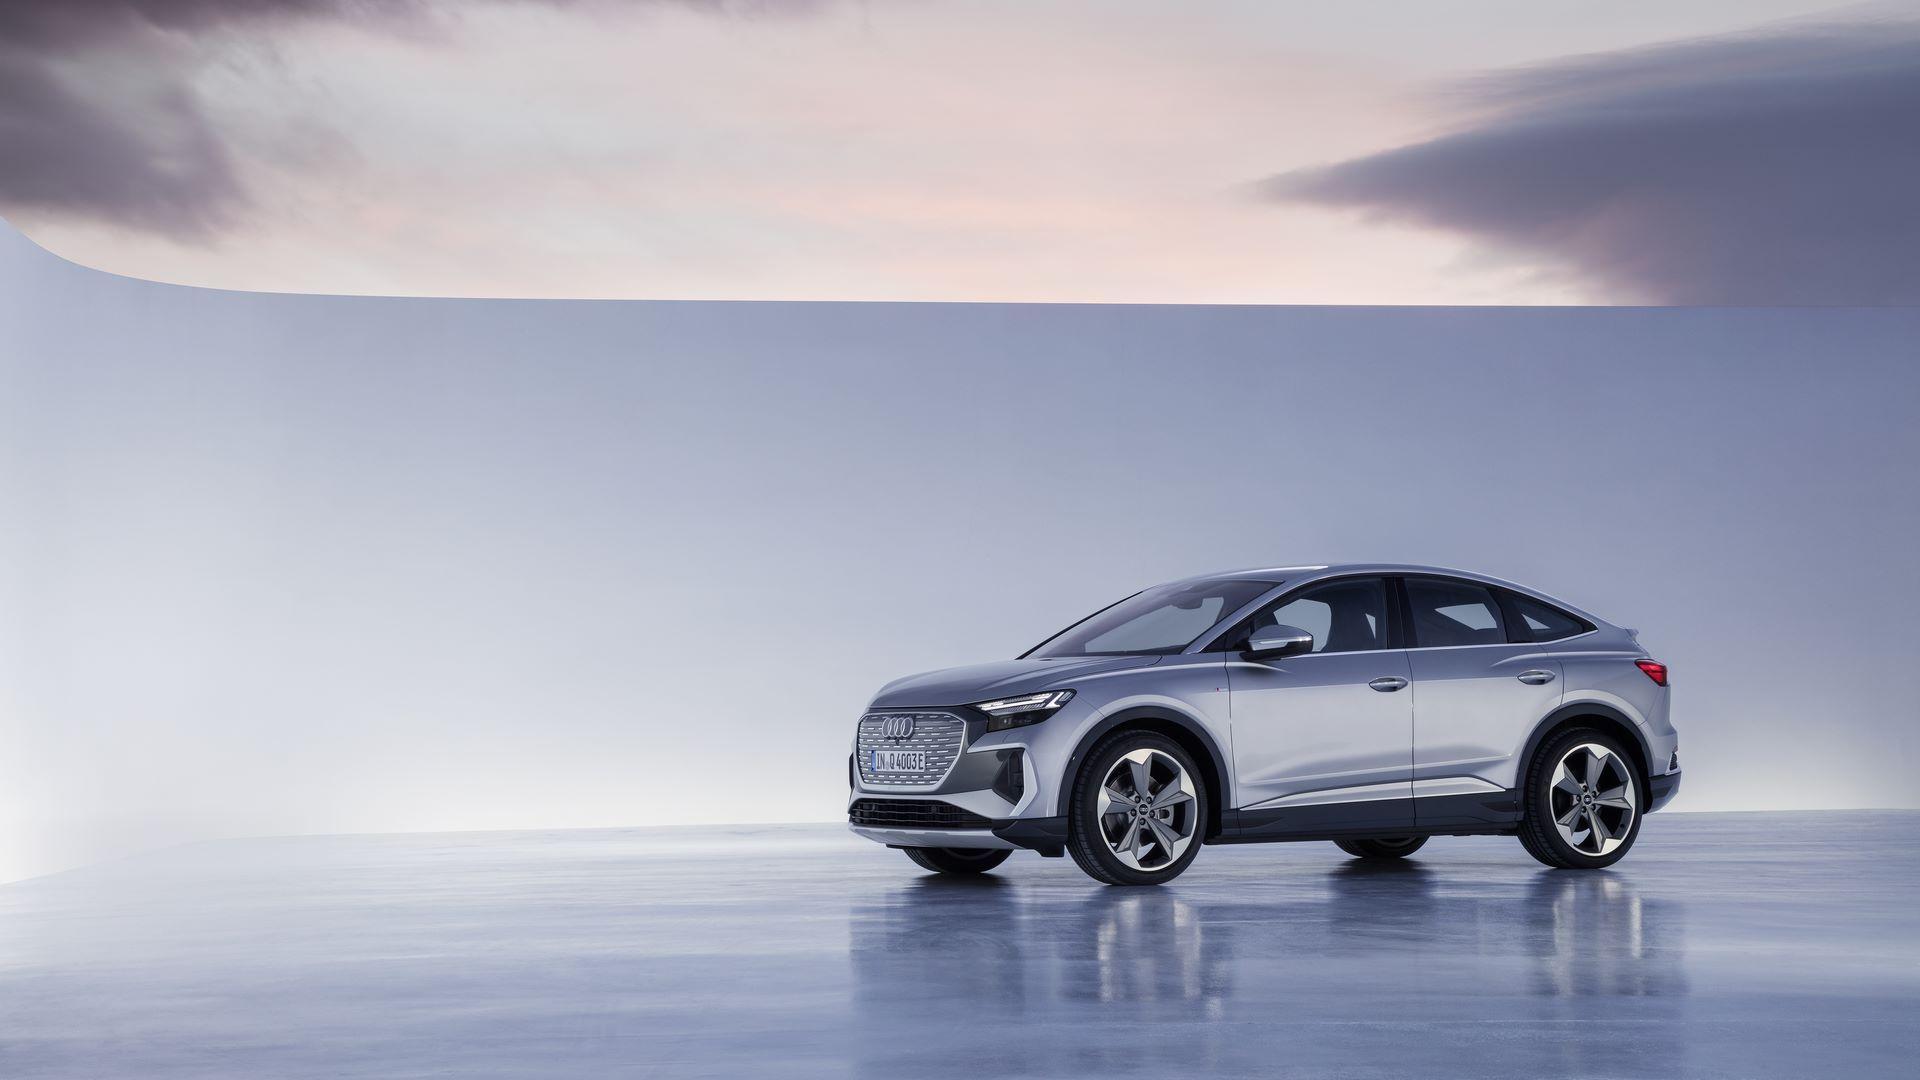 Audi-Q4-e-tron-and-Q4-e-tron-Sportback-35